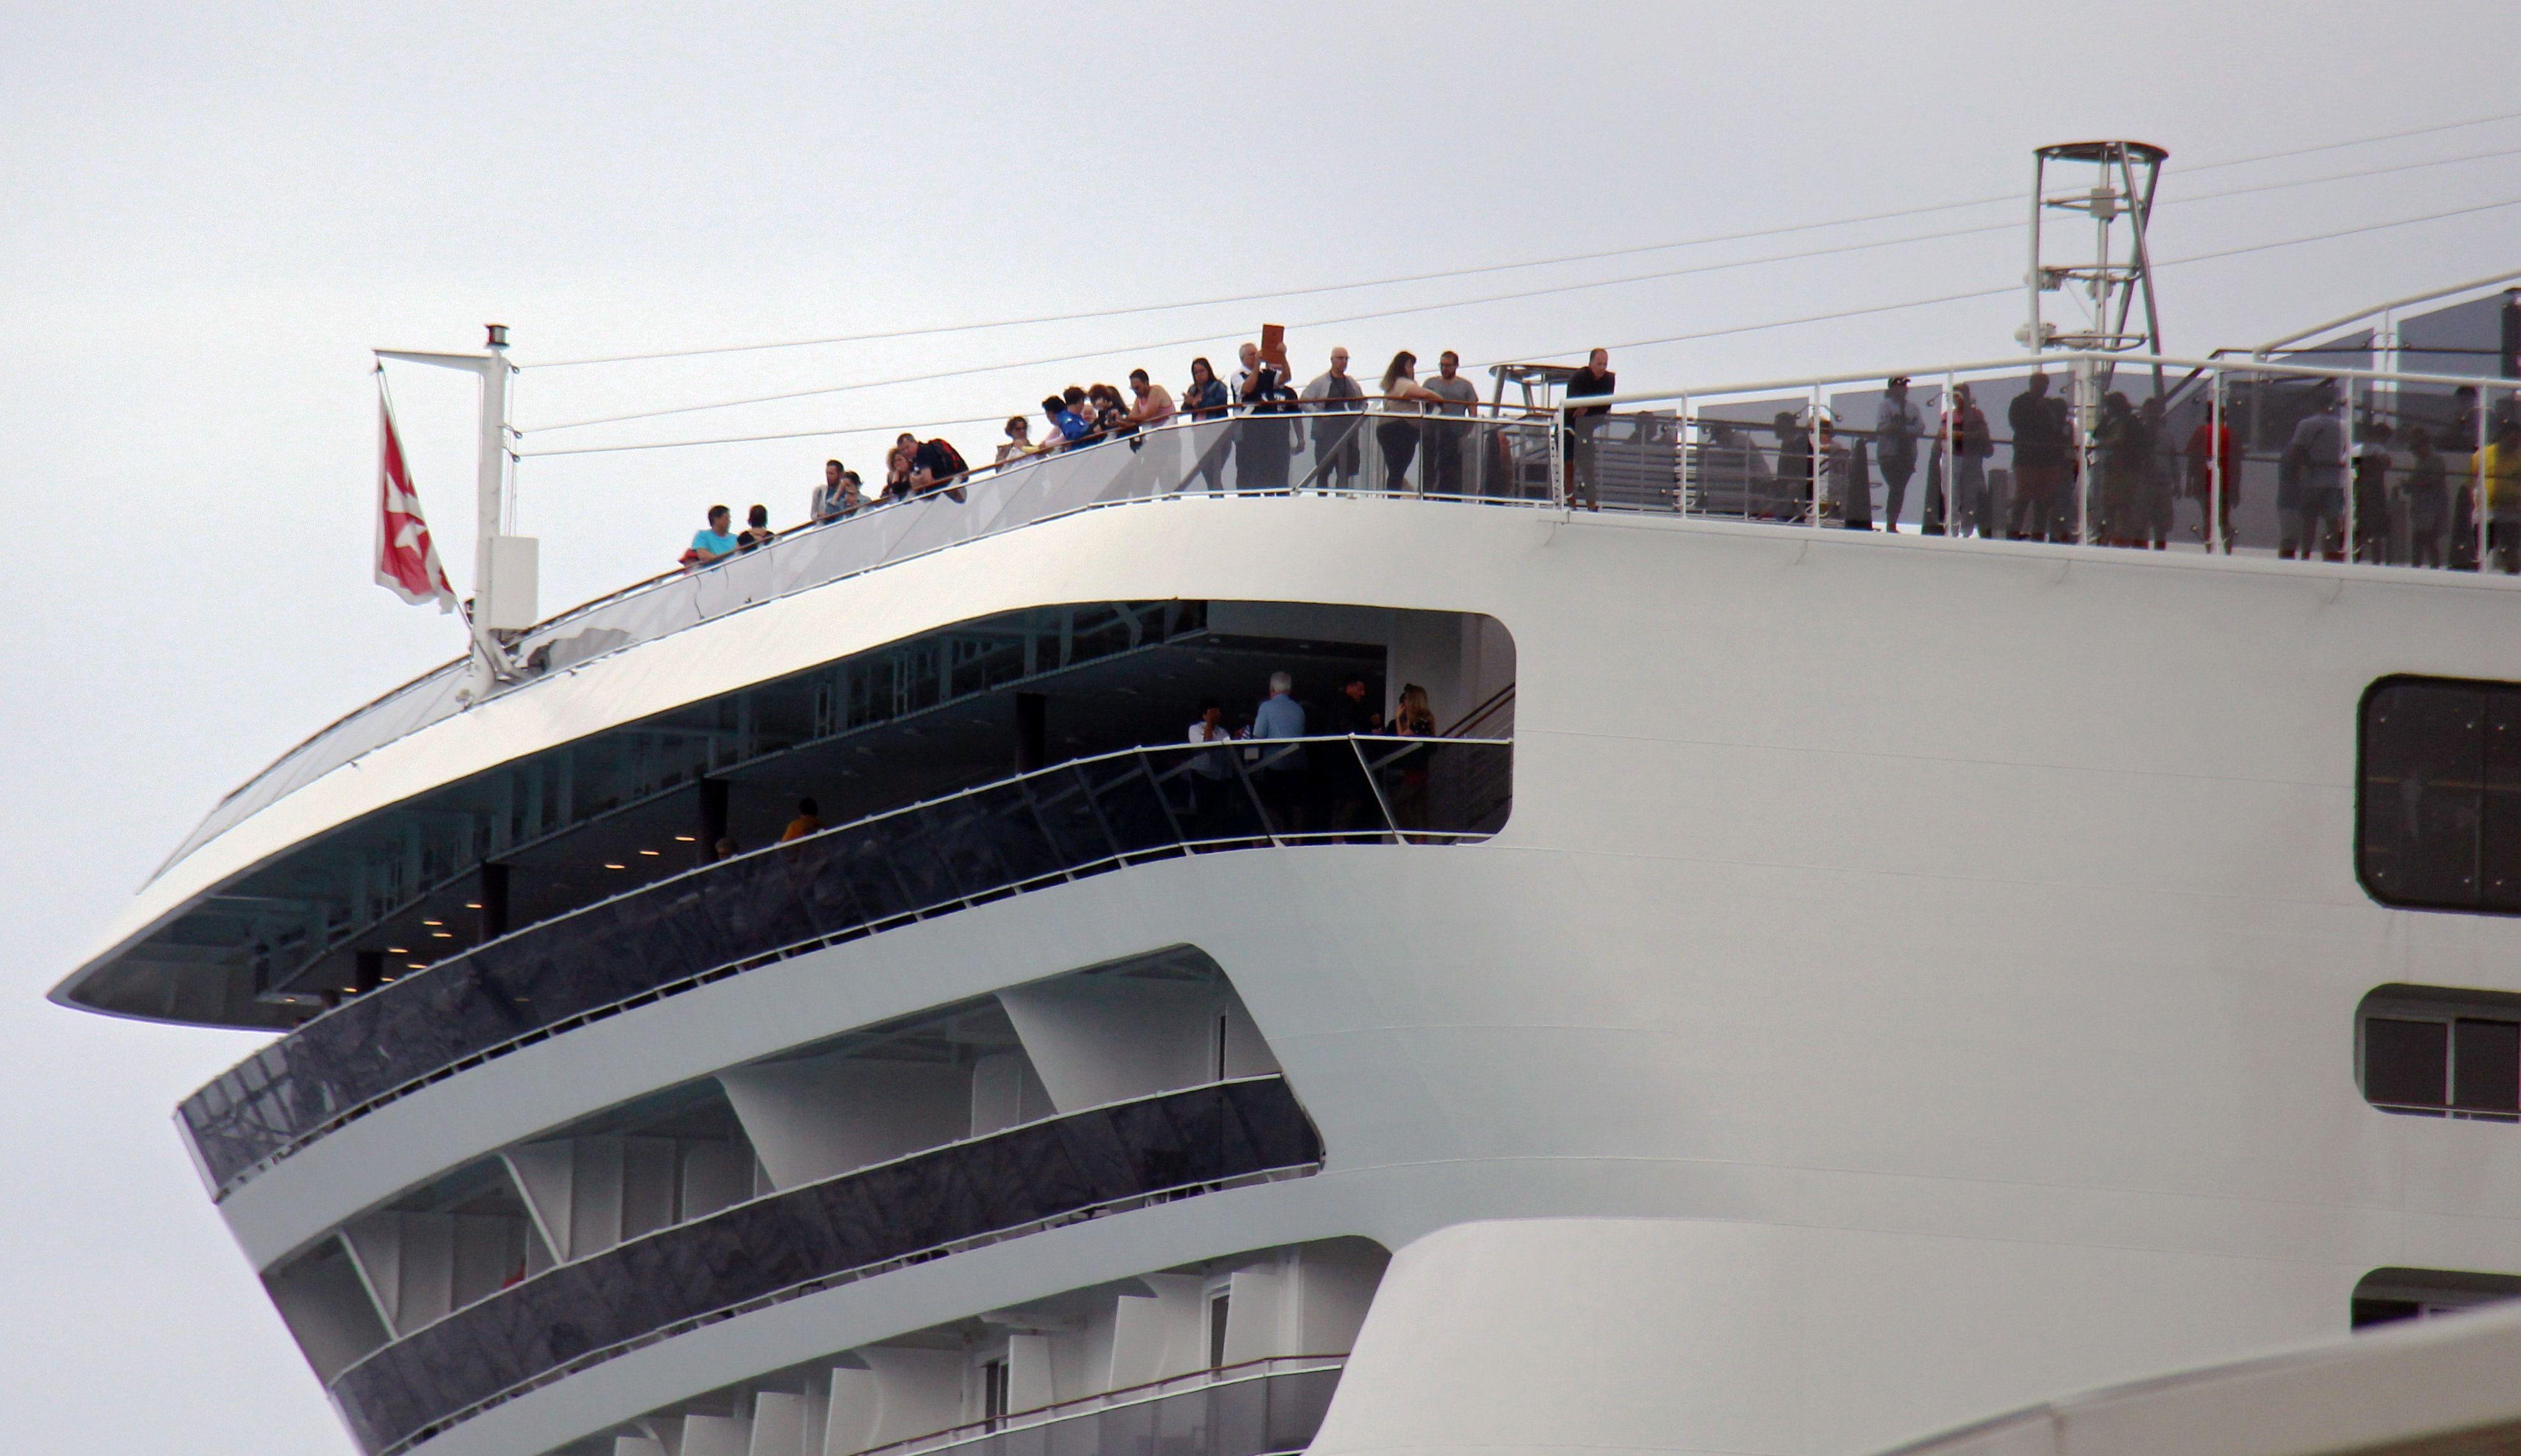 MSC Meraviglia cruise ship